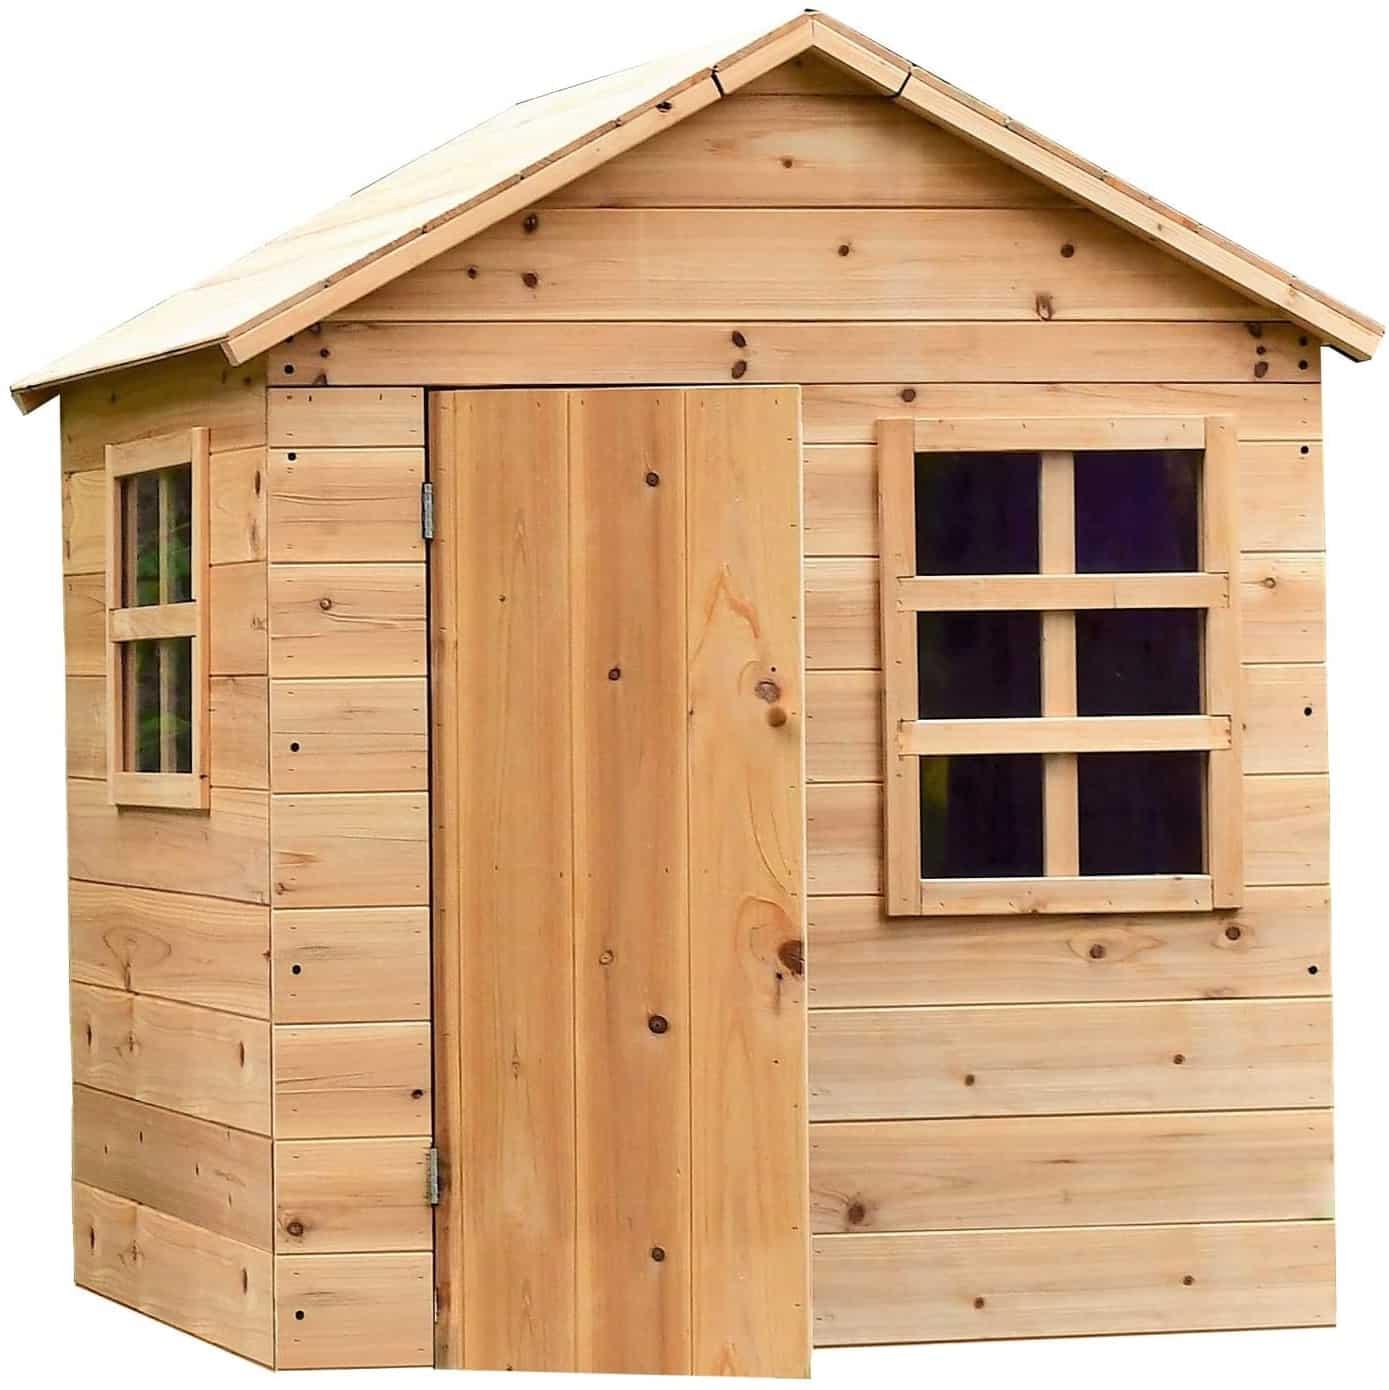 cabane en bois enfant maisonnette en bois enfant